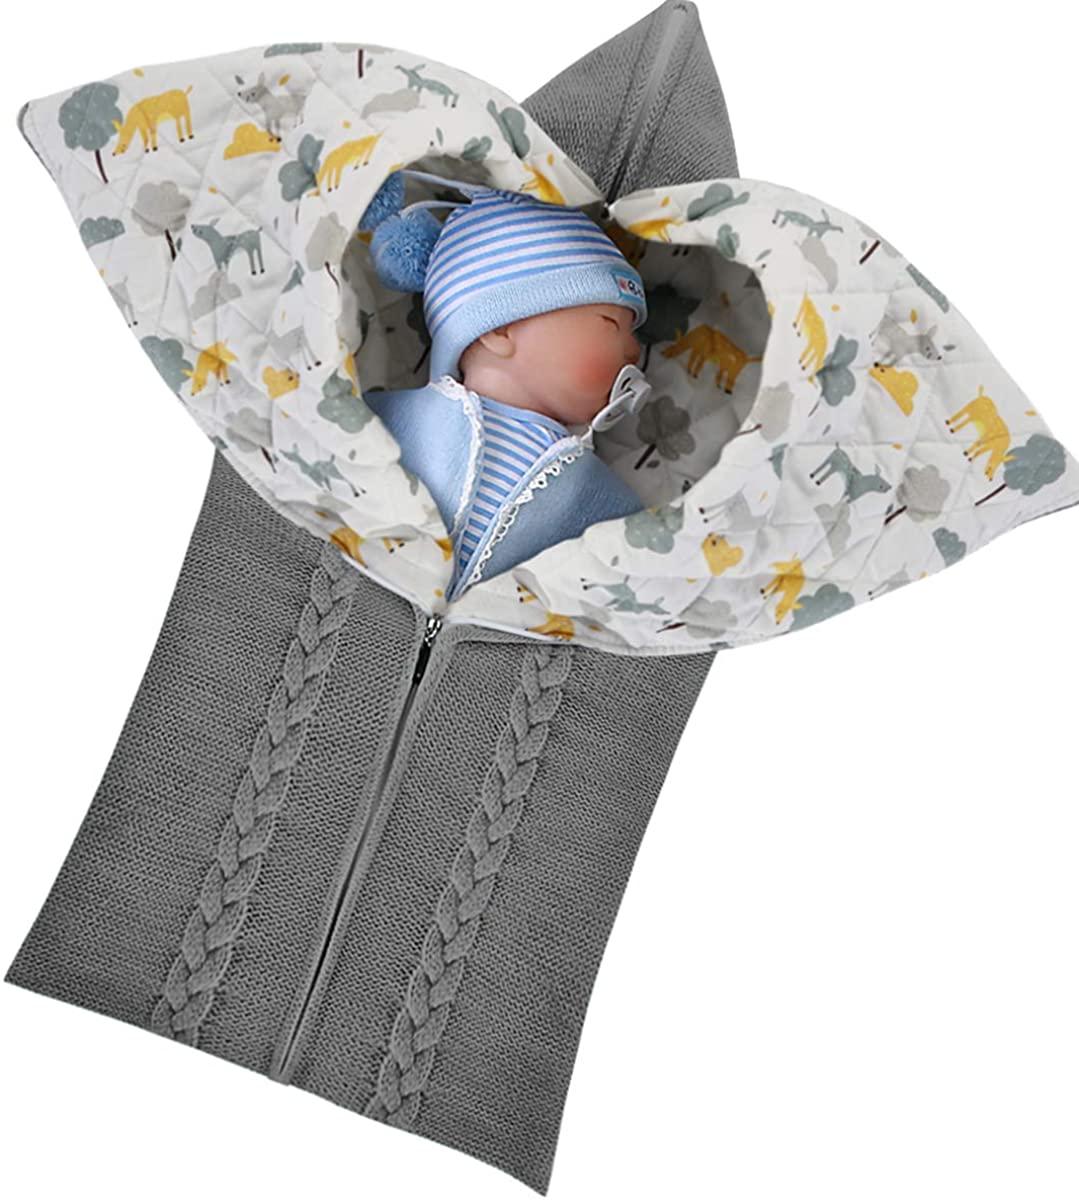 Josopa Newborn Baby Swaddle Knit Stroller Wrap, Toddler Thick Warm Sleeping Bag Sleep Sack, Fleece Receiving Nap Blanket for Boys Girls (White)